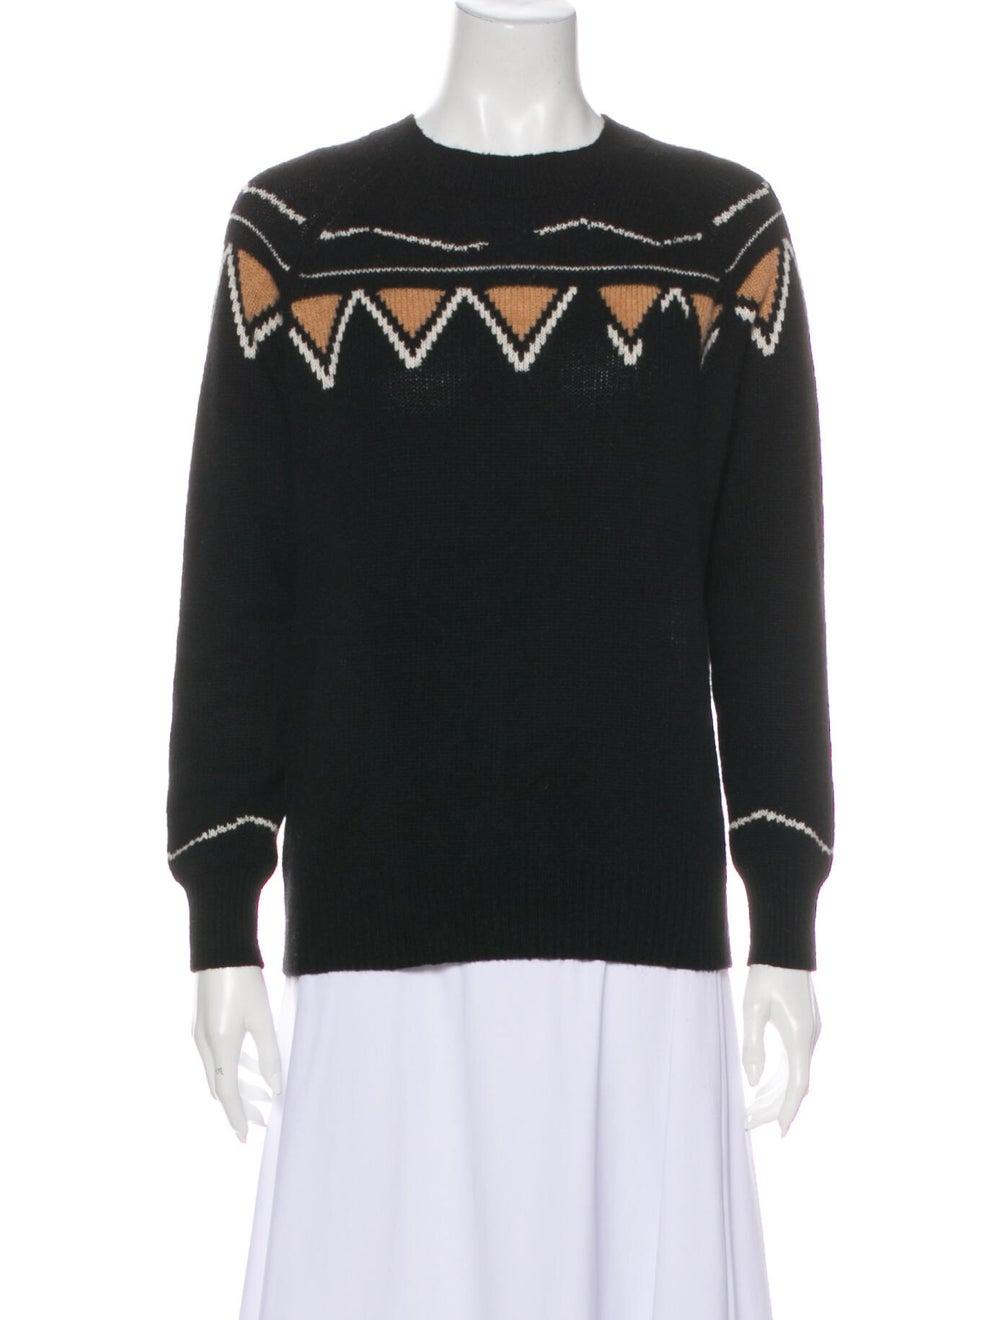 360 Cashmere Cashmere Patterned Sweater Black - image 1